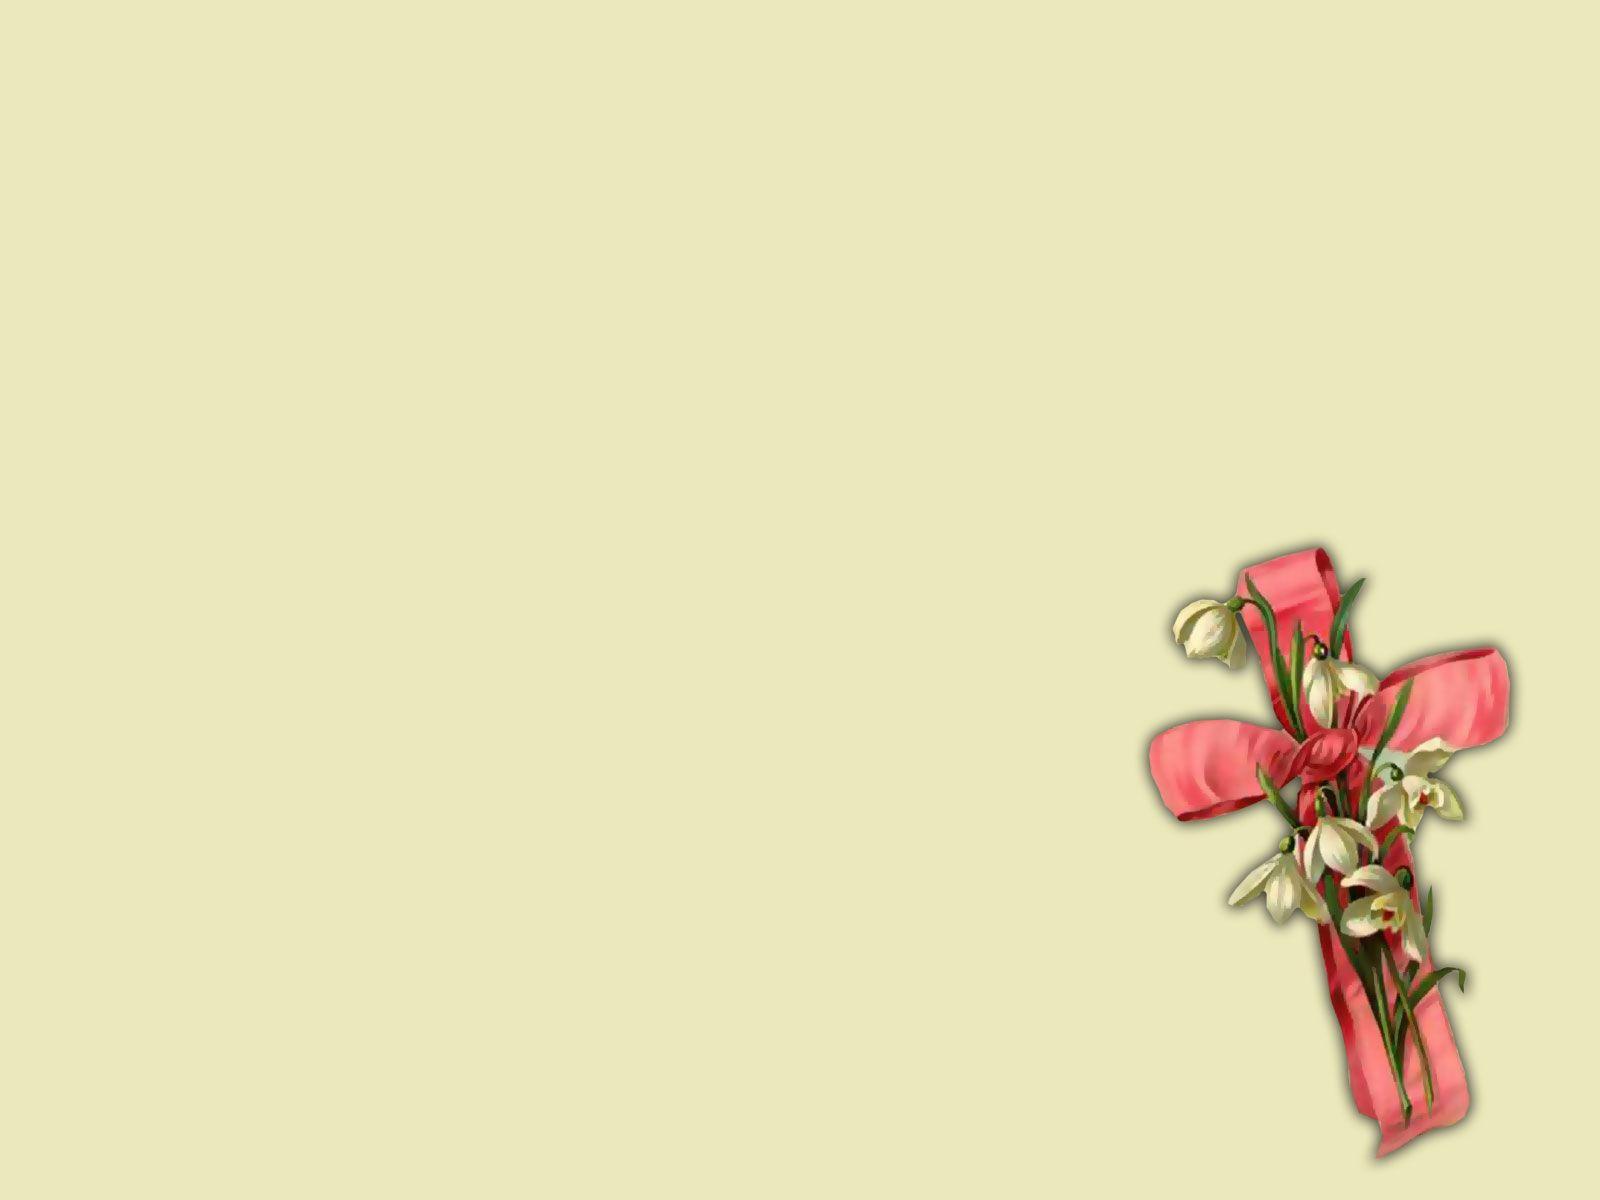 Happy Easter Cross | Religious Backgrounds | Pinterest | Easter ...